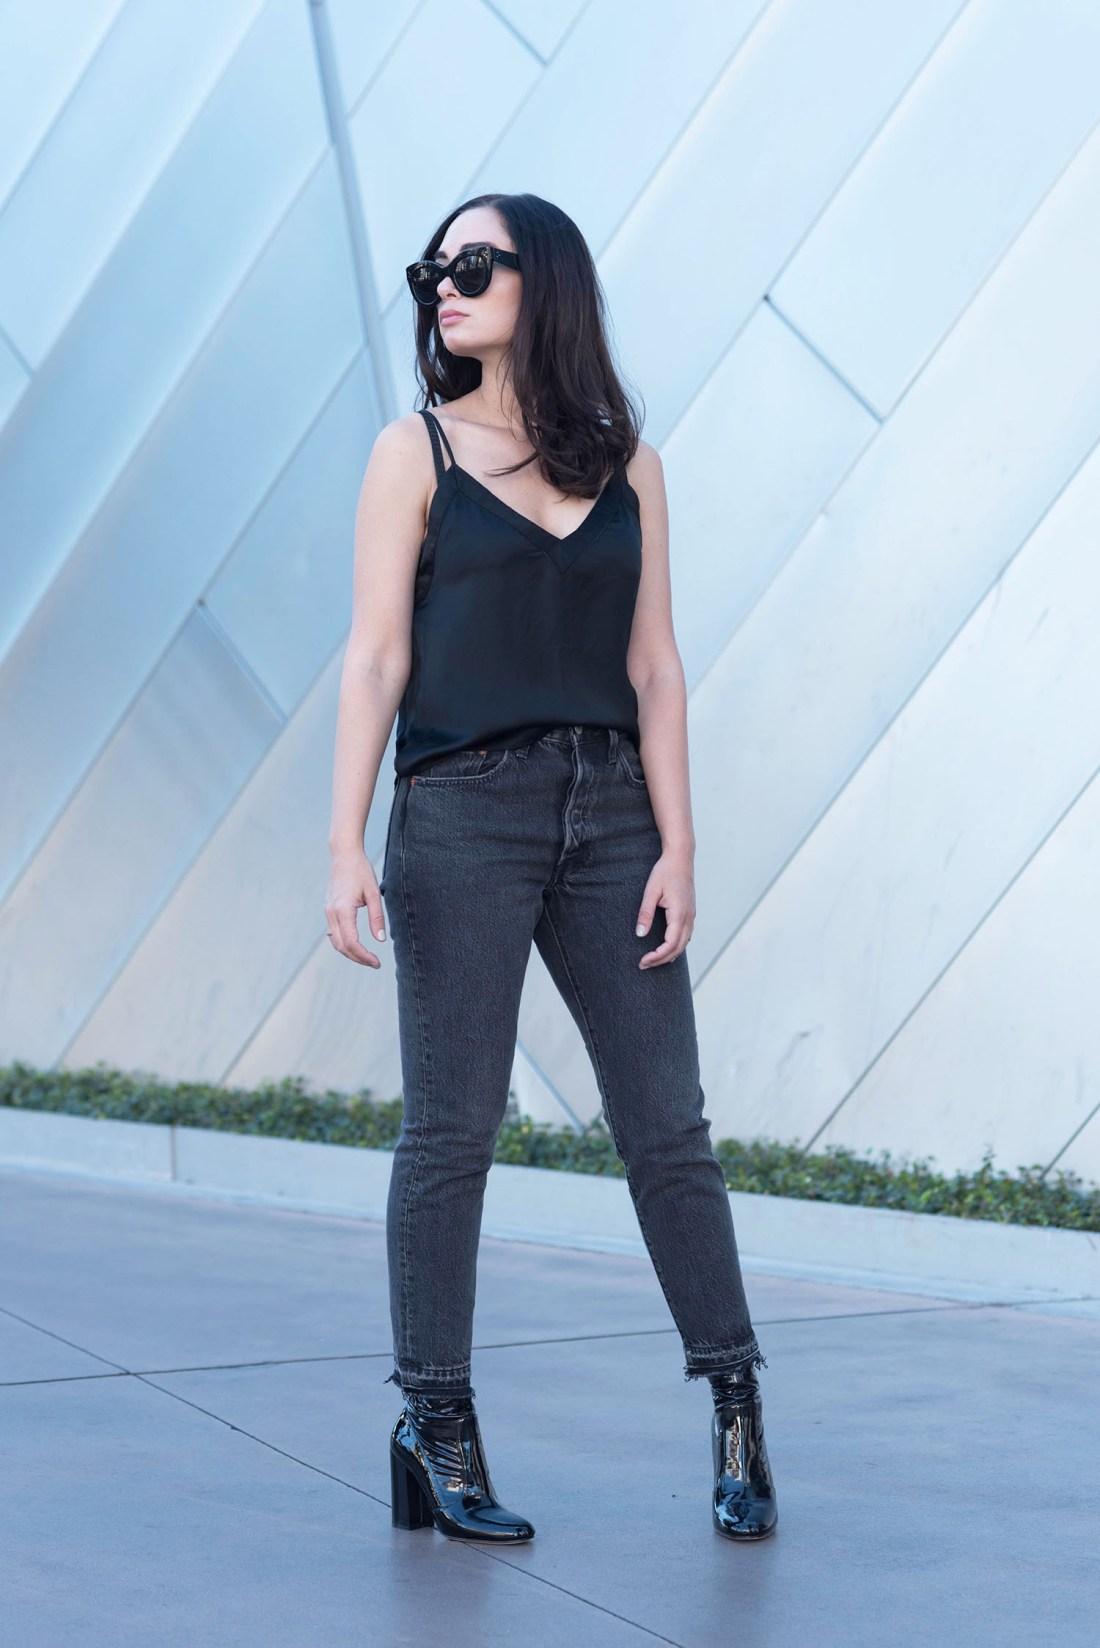 Winnipeg fashion blogger Cee Fardoe of Coco & Vera in Las Vegas wearing an Aritzia black silk tank and Levis 501 skinny jeans